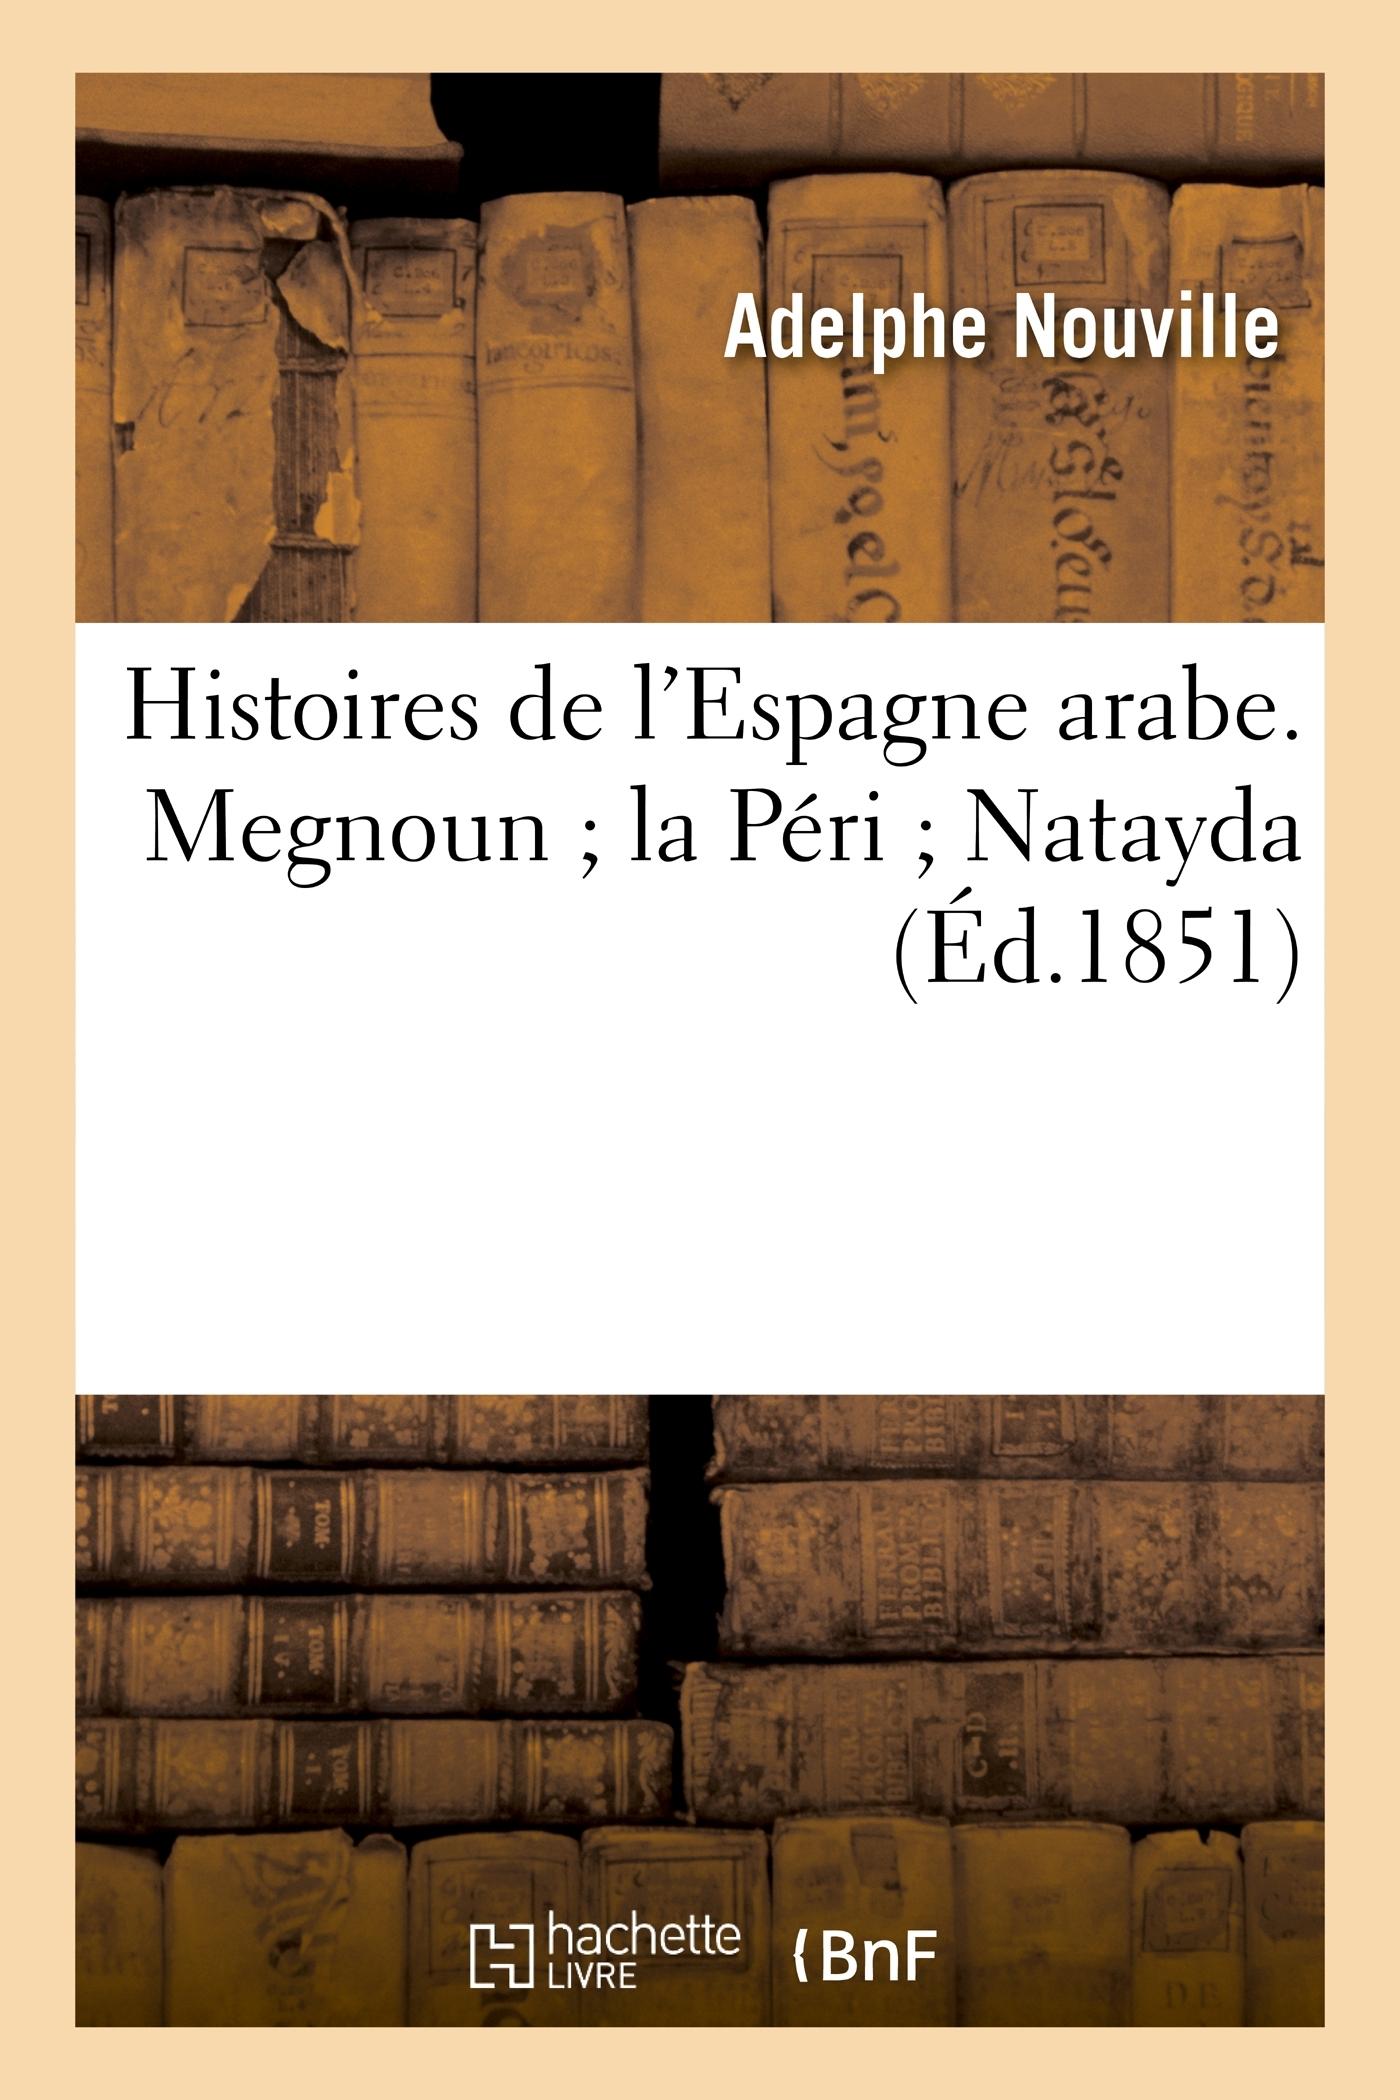 HISTOIRES DE L'ESPAGNE ARABE. MEGNOUN LA PERI NATAYDA